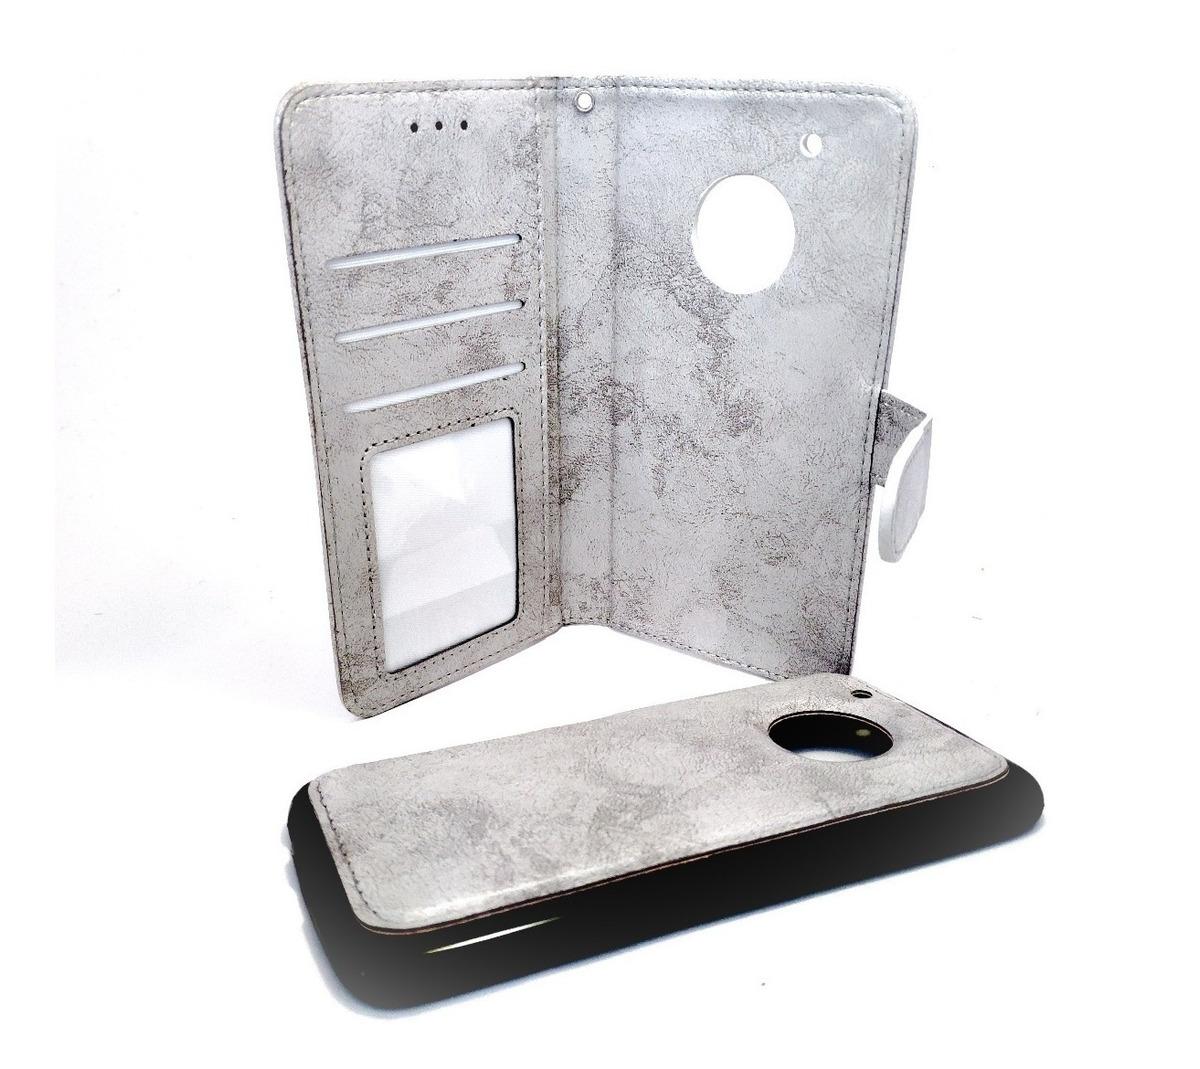 d4f85f2b0dc Funda Tapa Agenda Flip Cover Duo + Tpu Motorola Moto G5 Plus - $ 350 ...